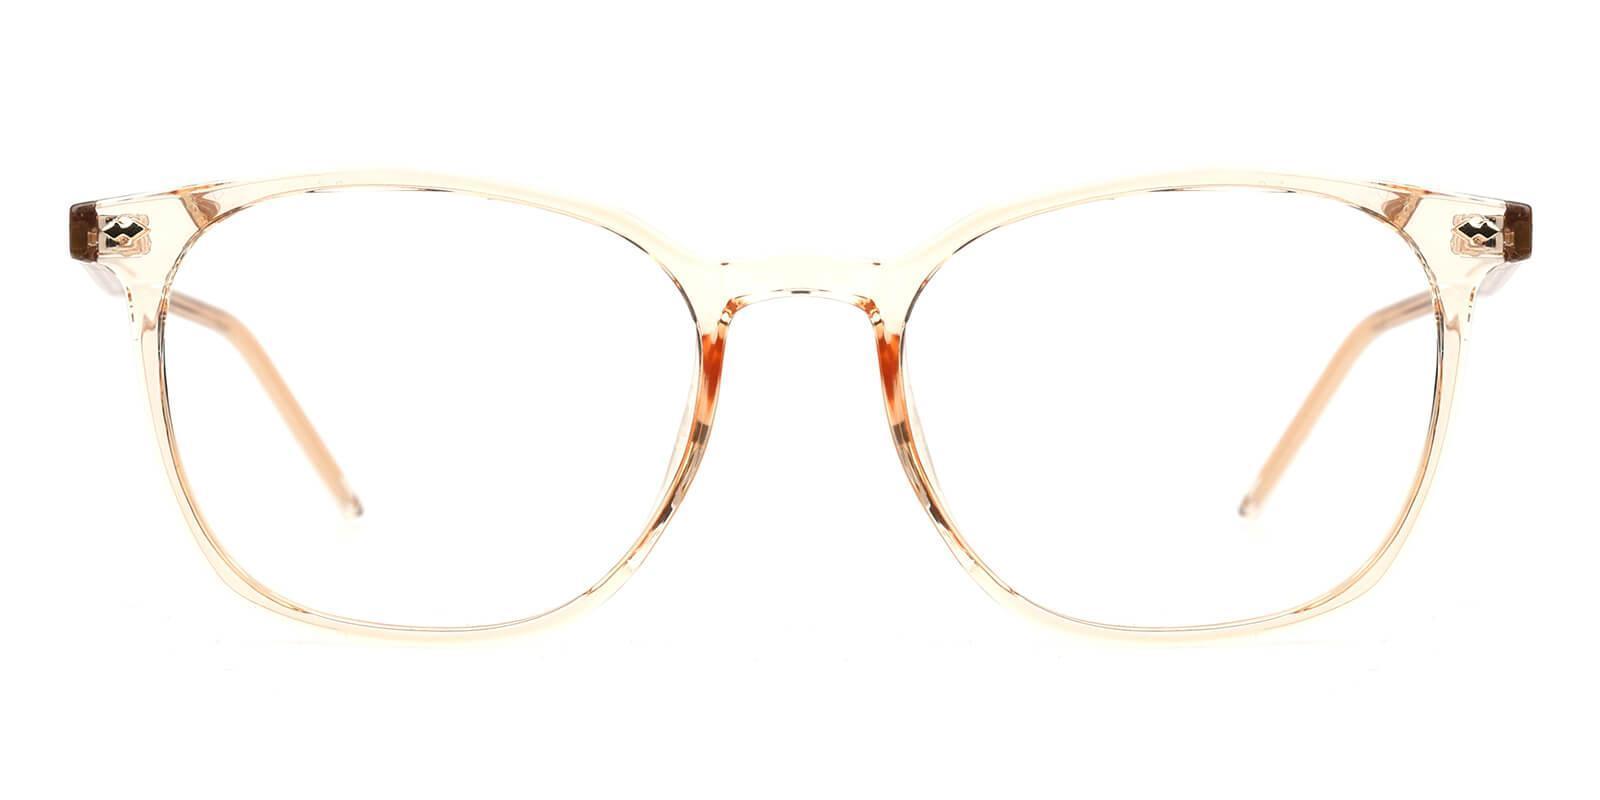 Prodigy Orange Acetate SpringHinges , UniversalBridgeFit , Eyeglasses Frames from ABBE Glasses